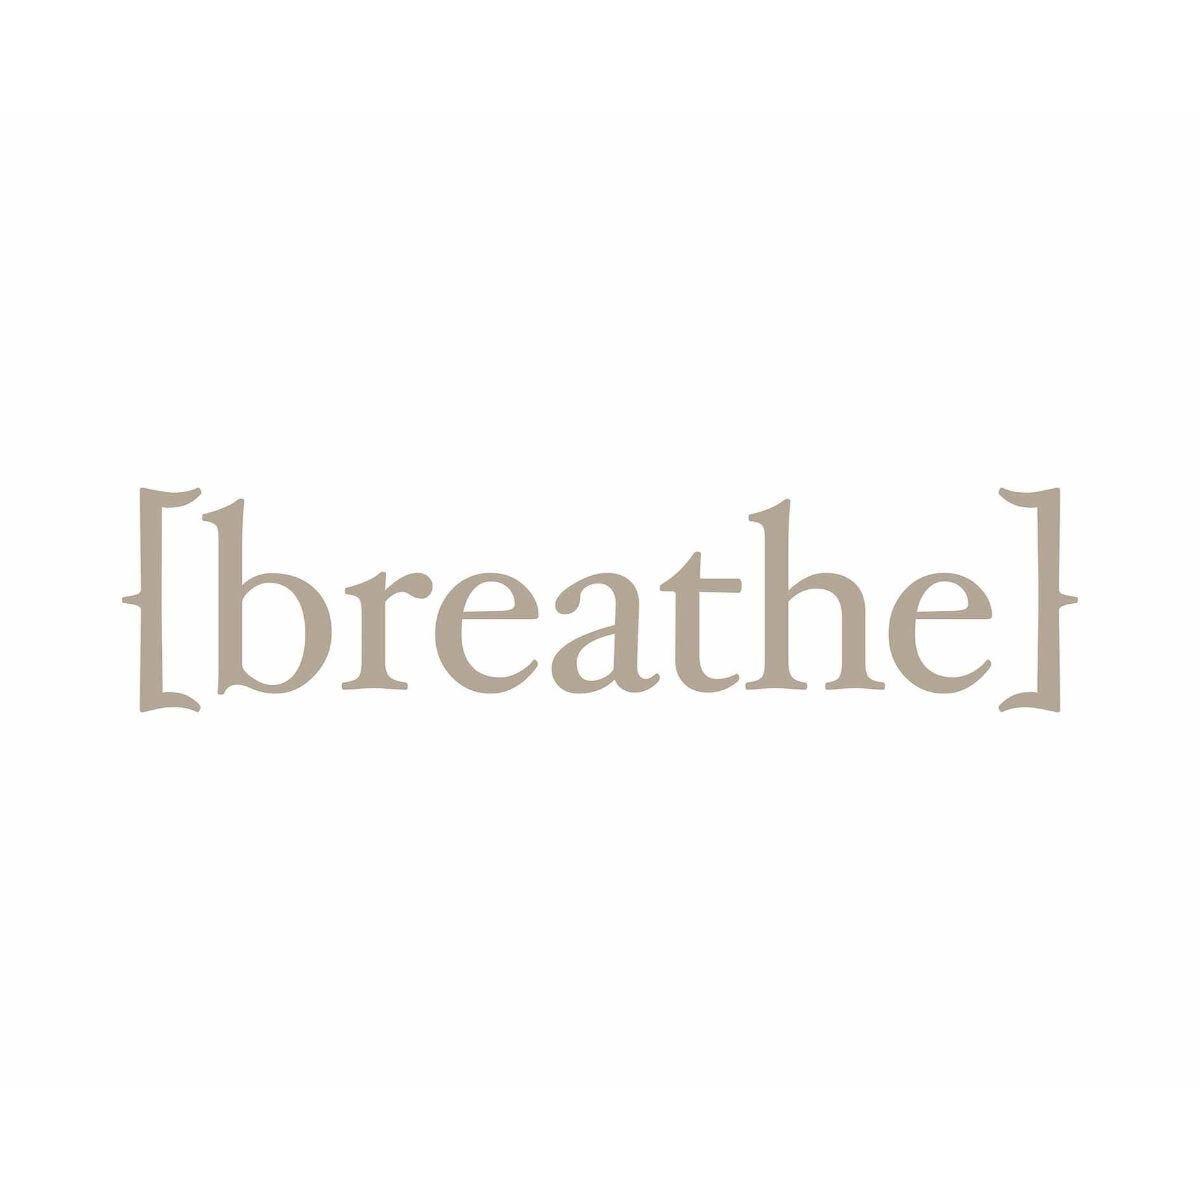 Breathe Wall Decor